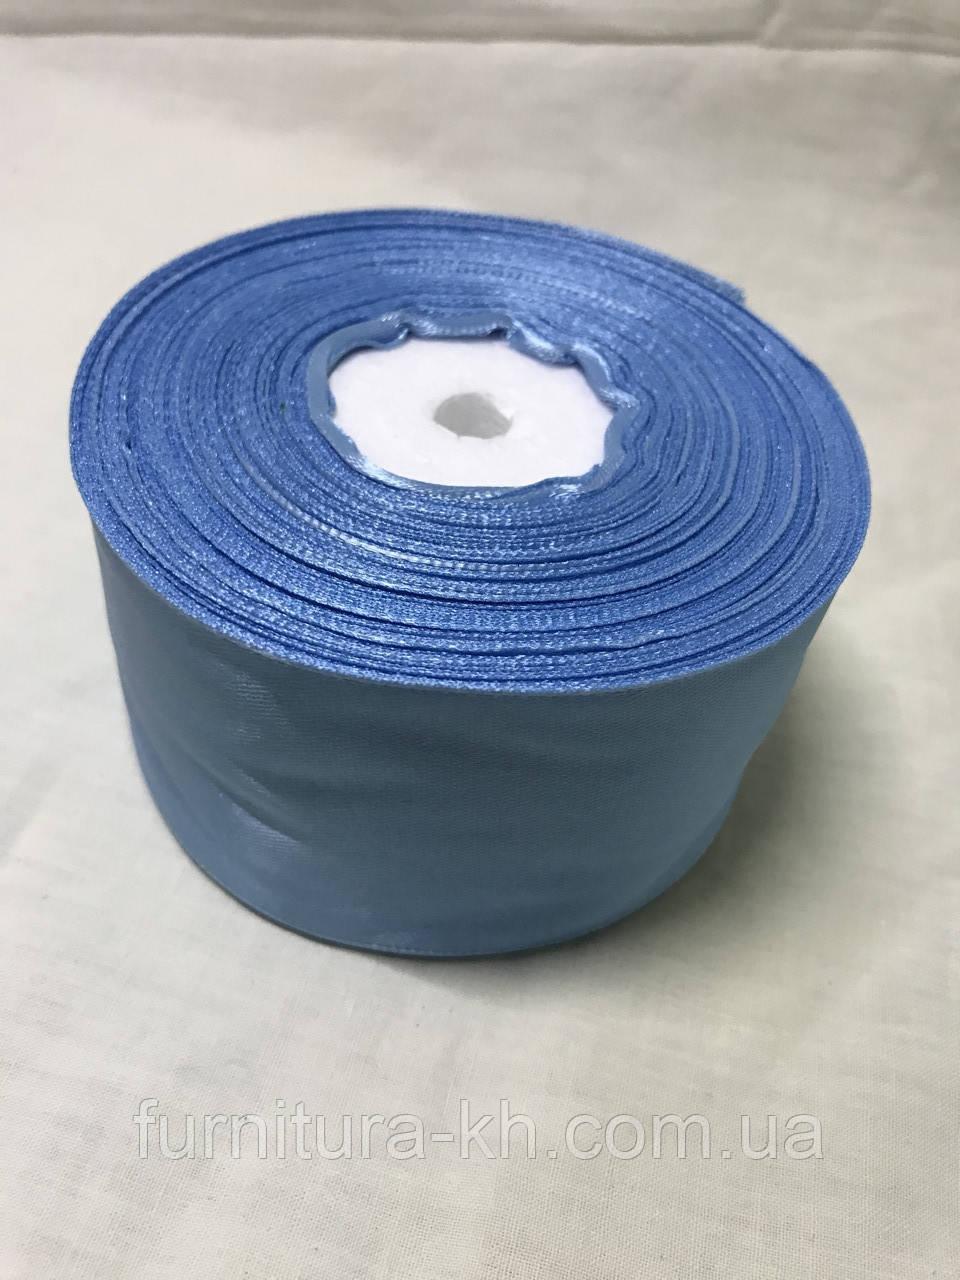 Лента атласная,ширина 5 см  (33 м )  цвет  Голубой